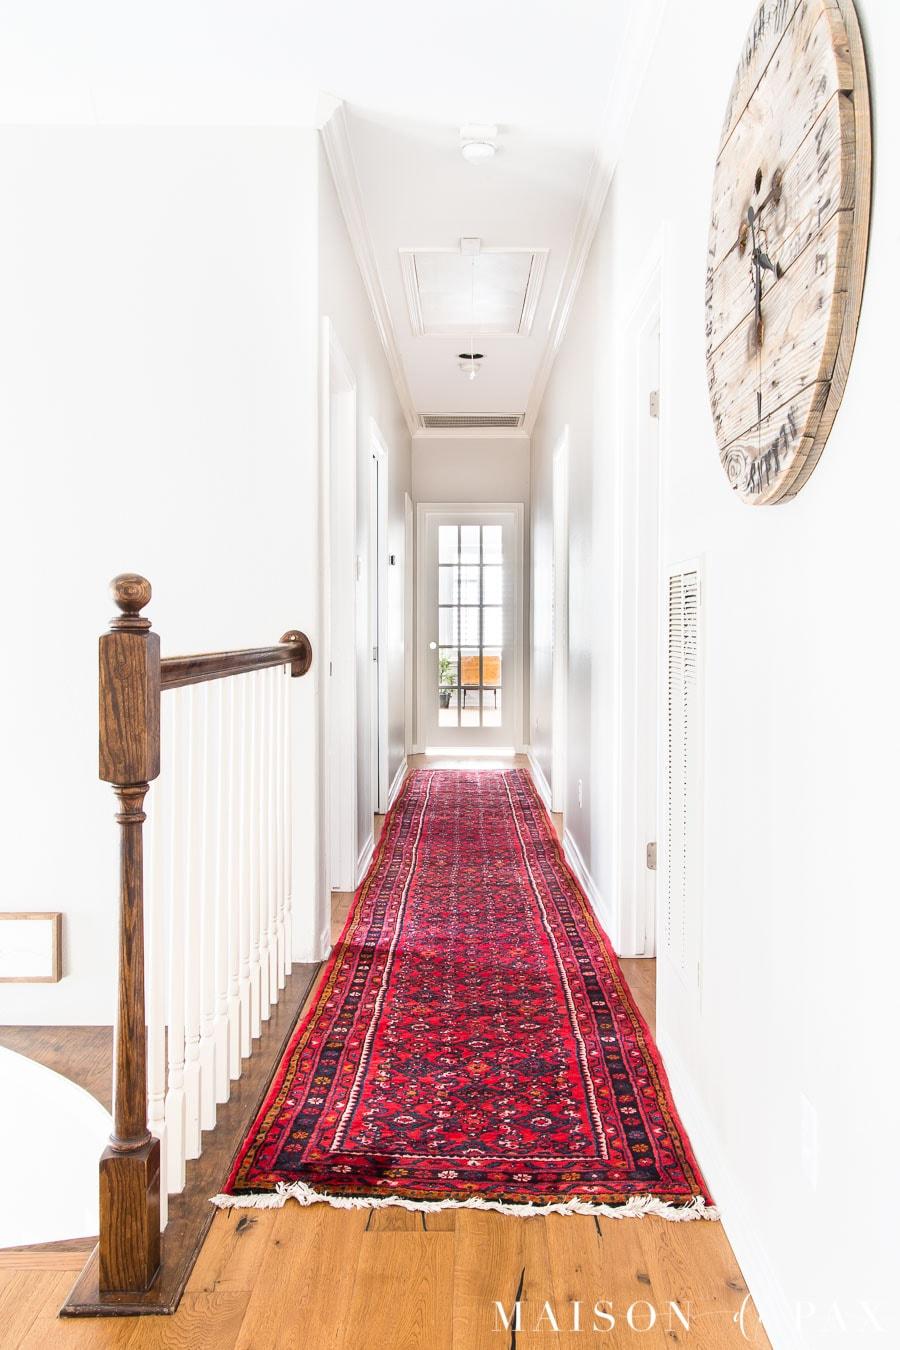 Where To Buy Vintage Rugs Maison De Pax